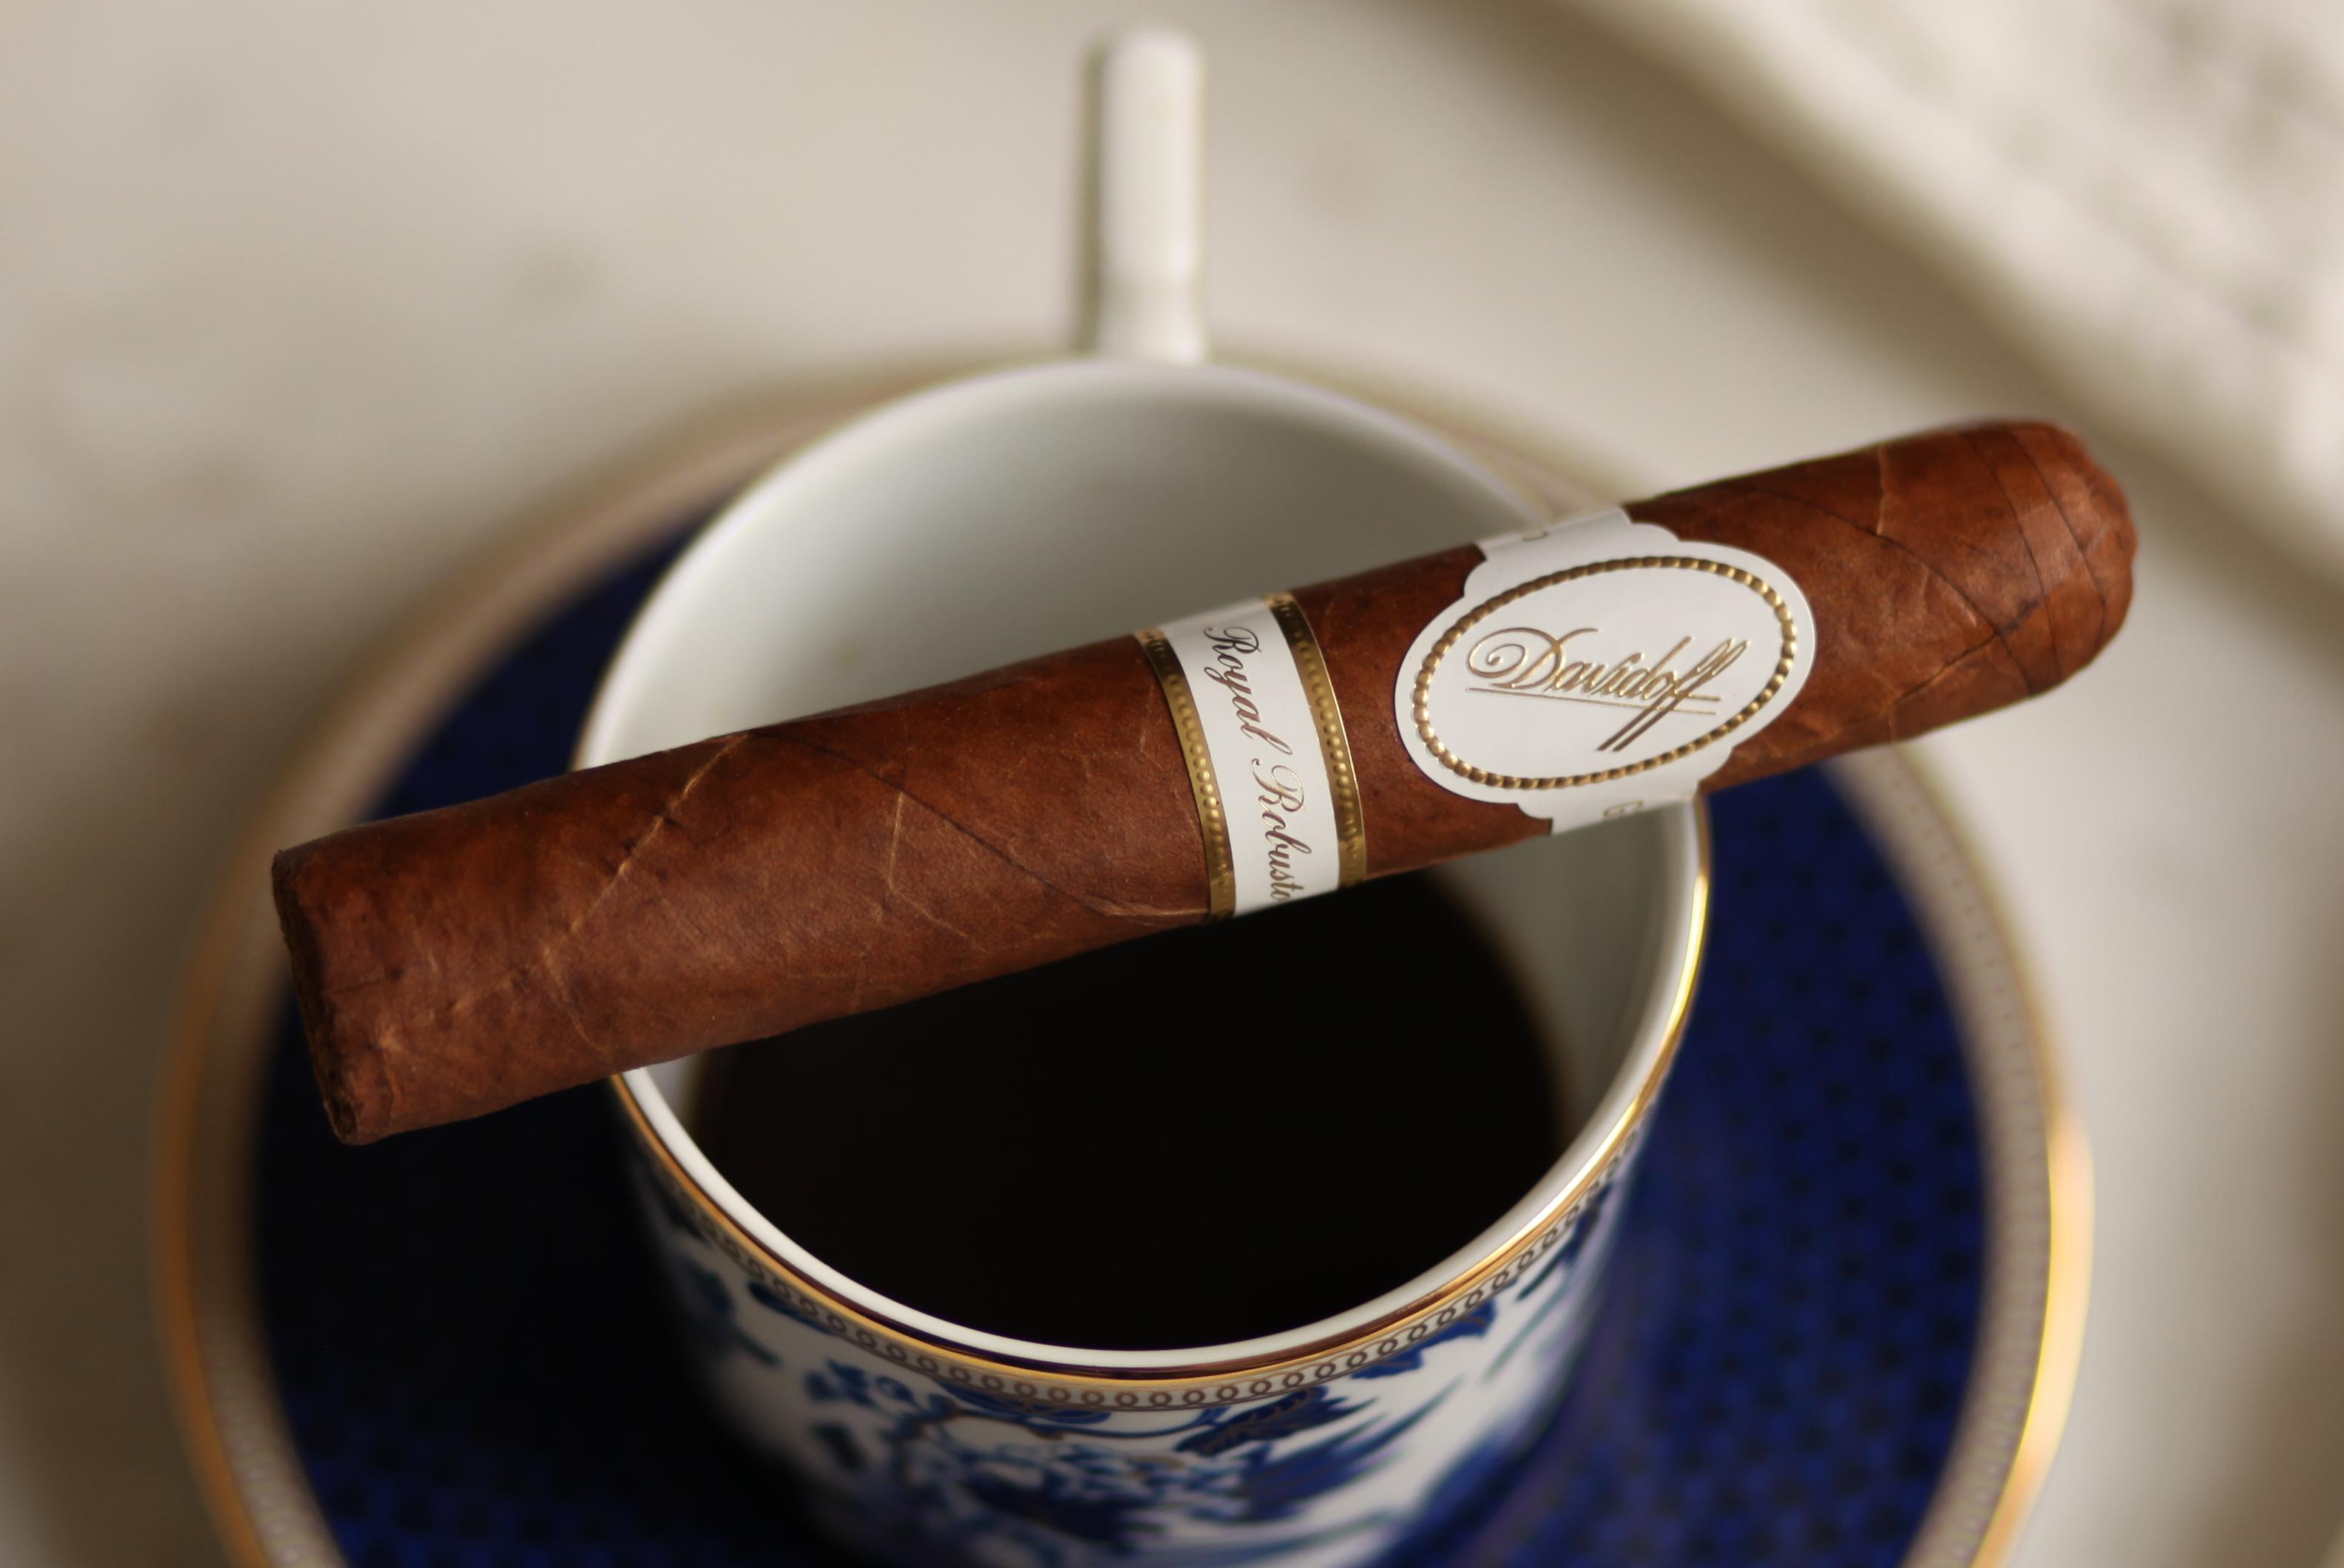 Davidoff Royal Robusto Review - Fine Tobacco NYC